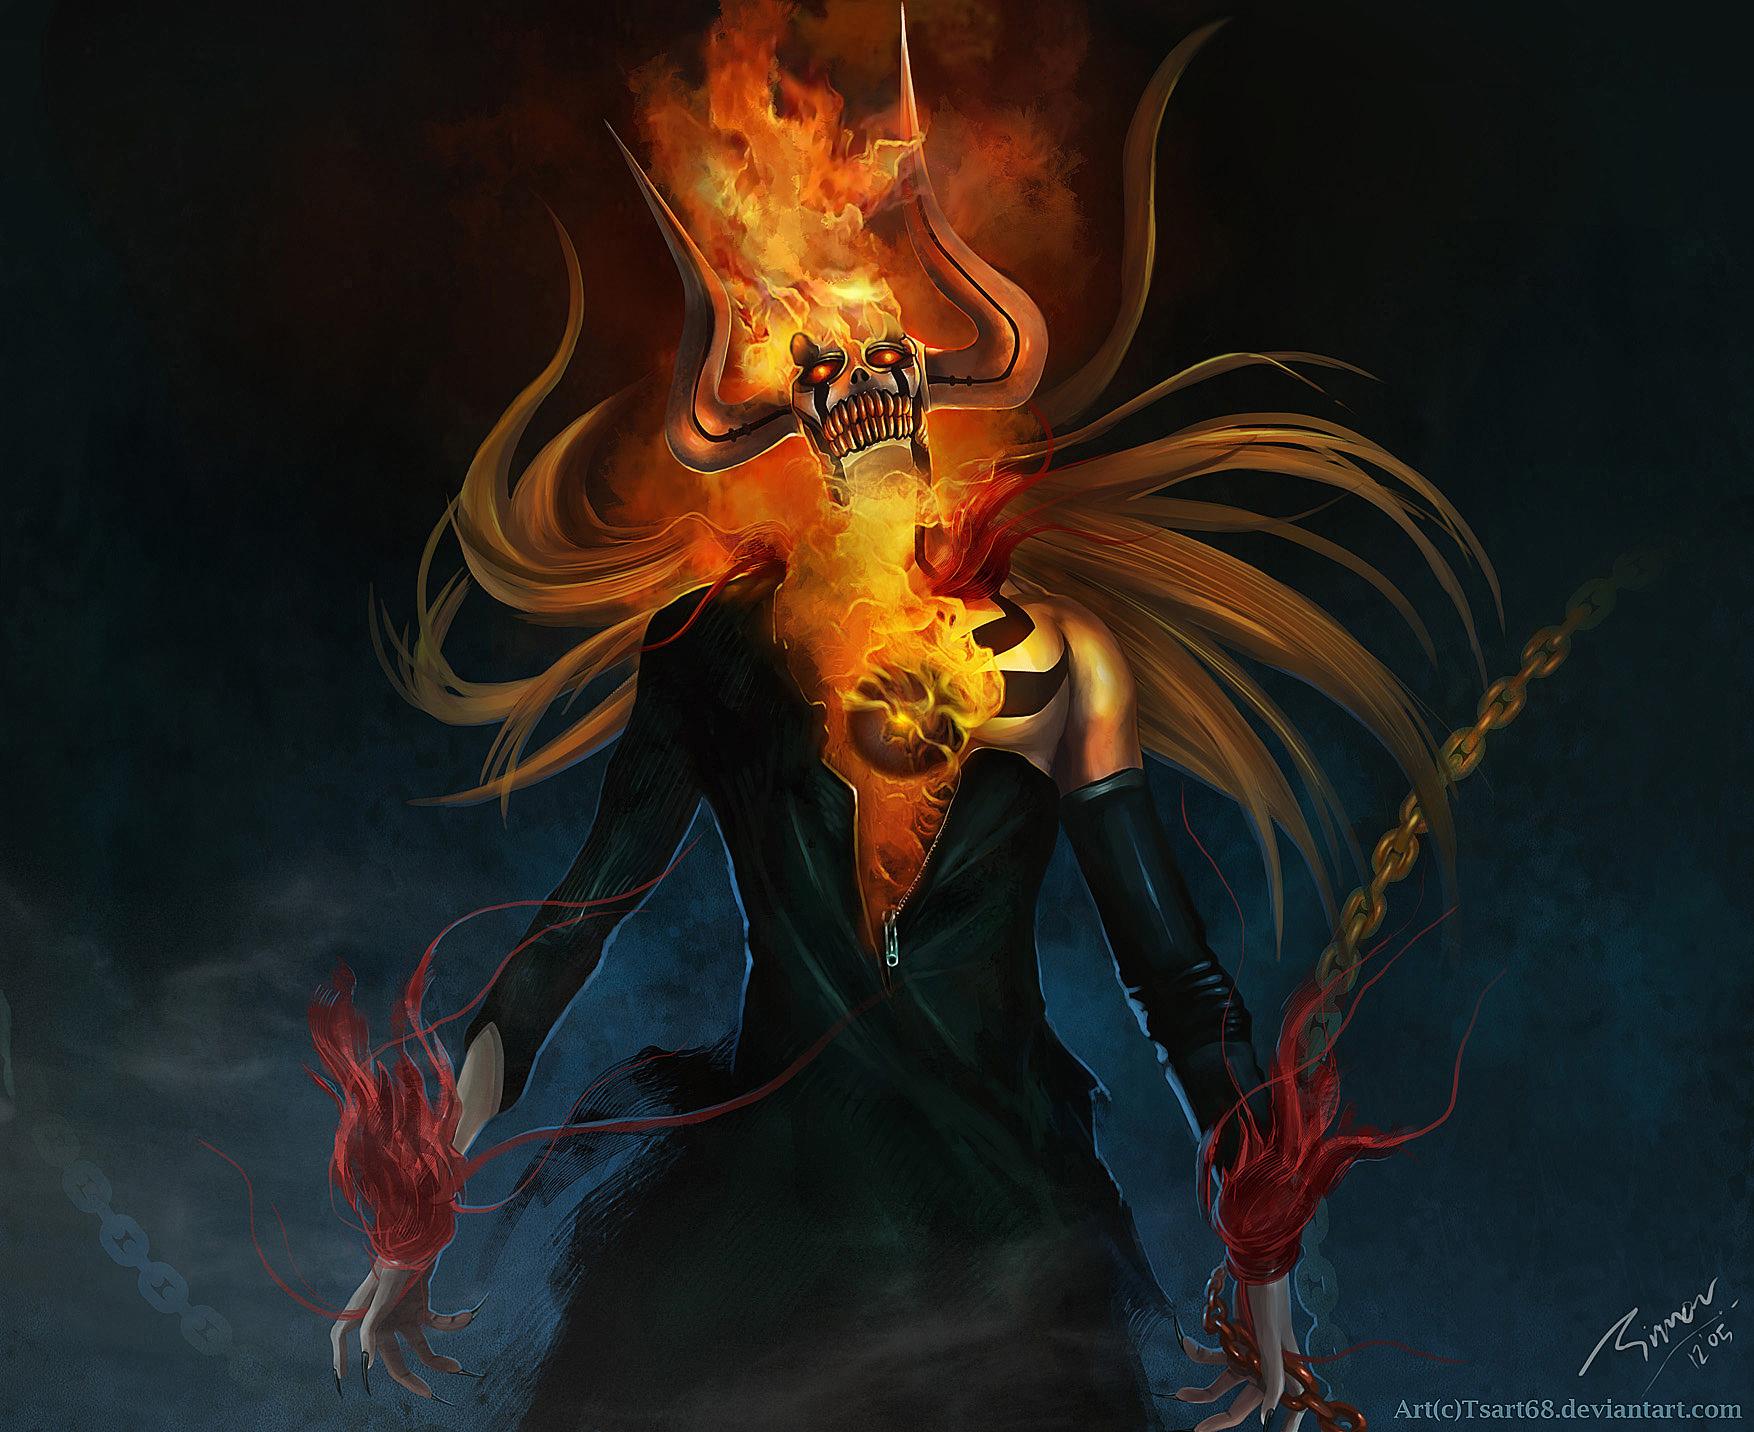 Hollow Rider – Hollow Ichigo and Ghost Rider | Daily Anime Art